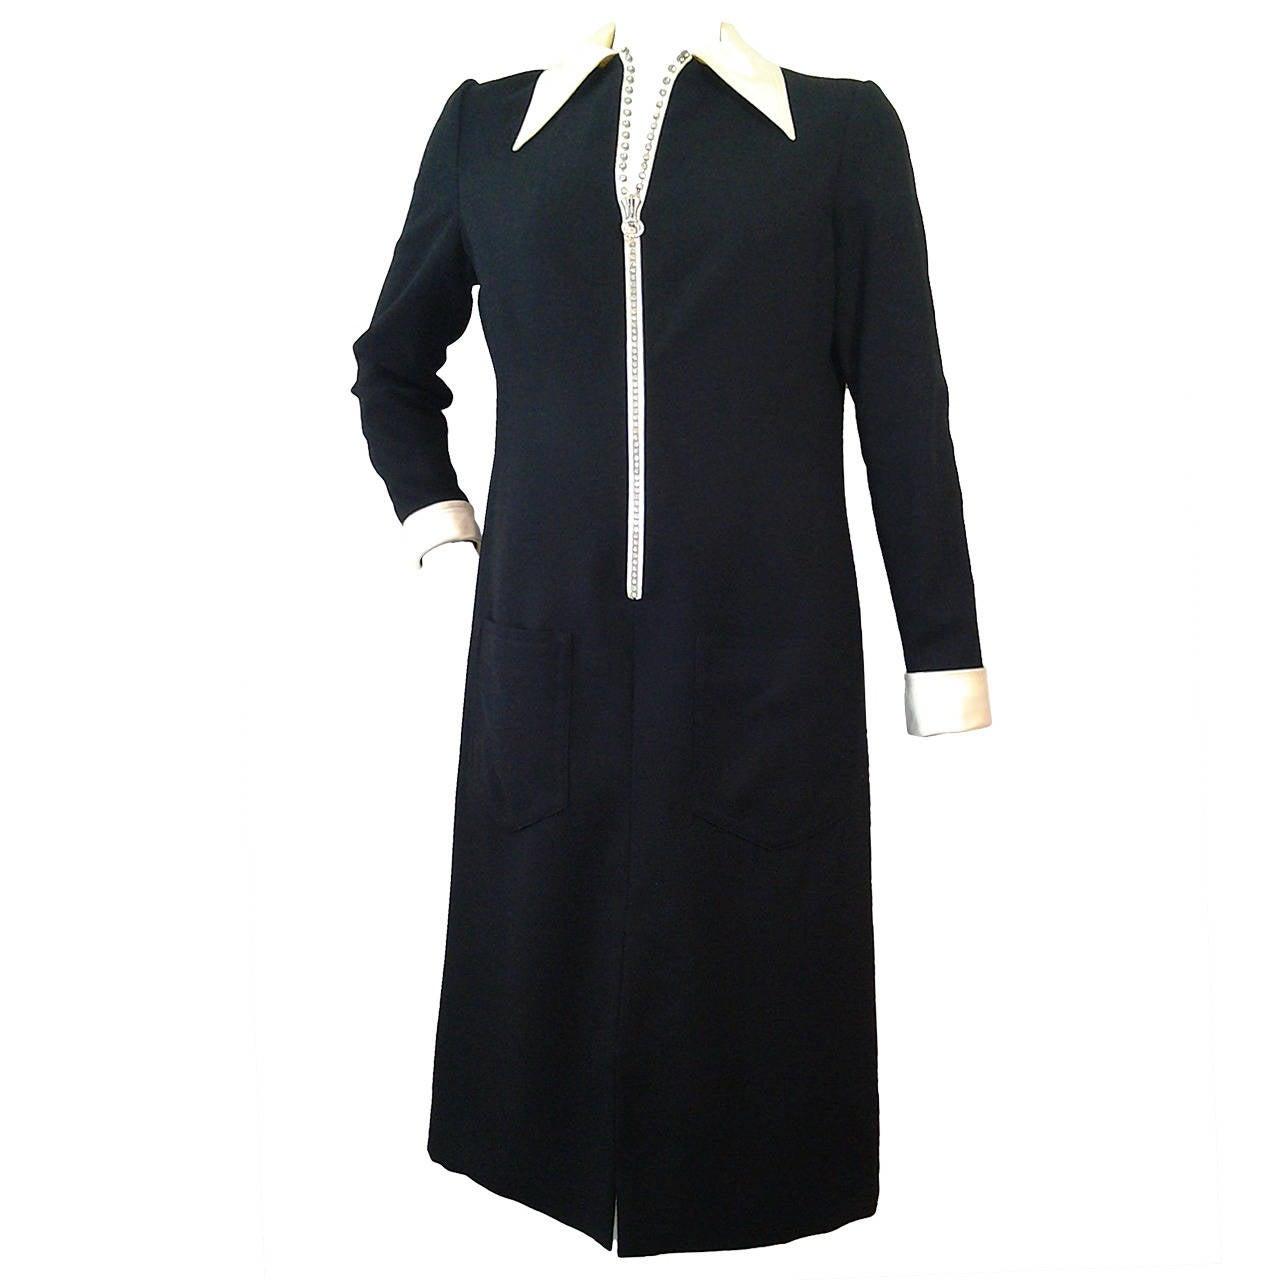 1960s Oscar de La Renta Wool Crepe Tuxedo Shirtdress w/ Rhinestone Zipper 1